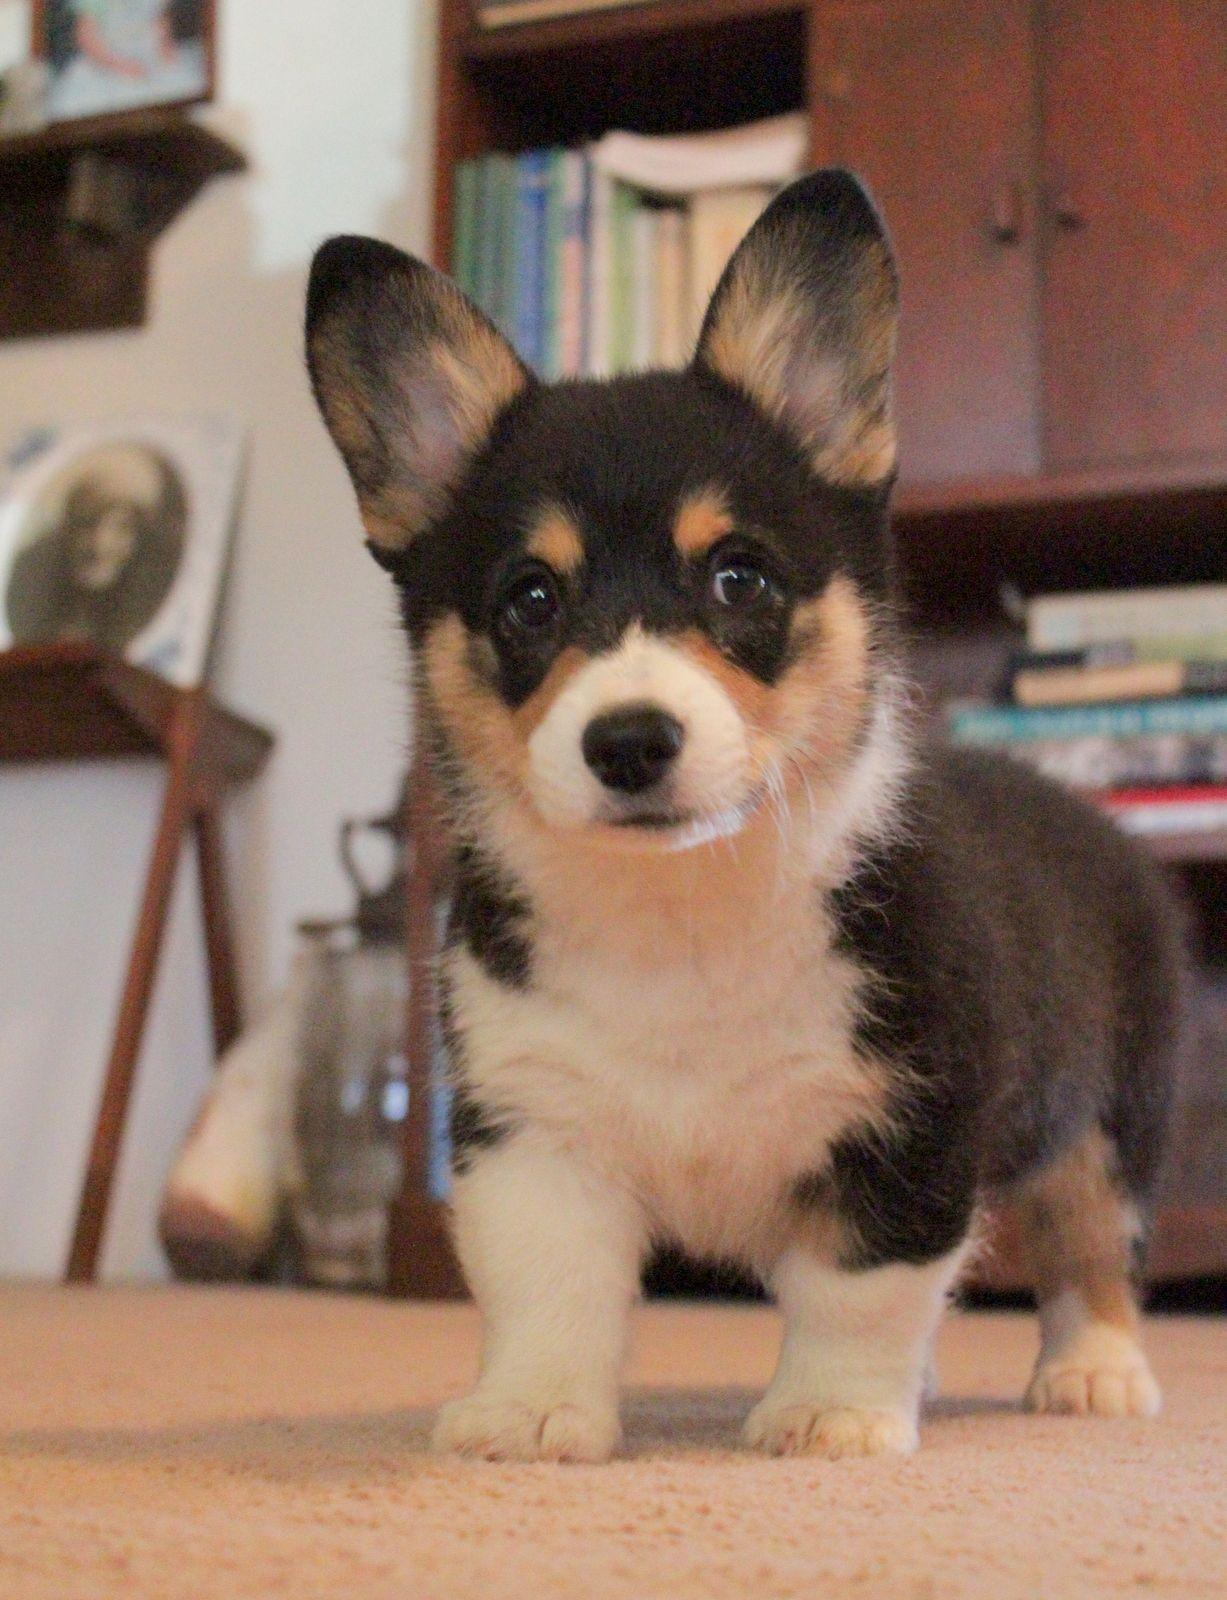 Pembroke Welsh Corgi Alert And Affectionate Corgi Dog Corgi Dog Breed Welsh Corgi Puppies